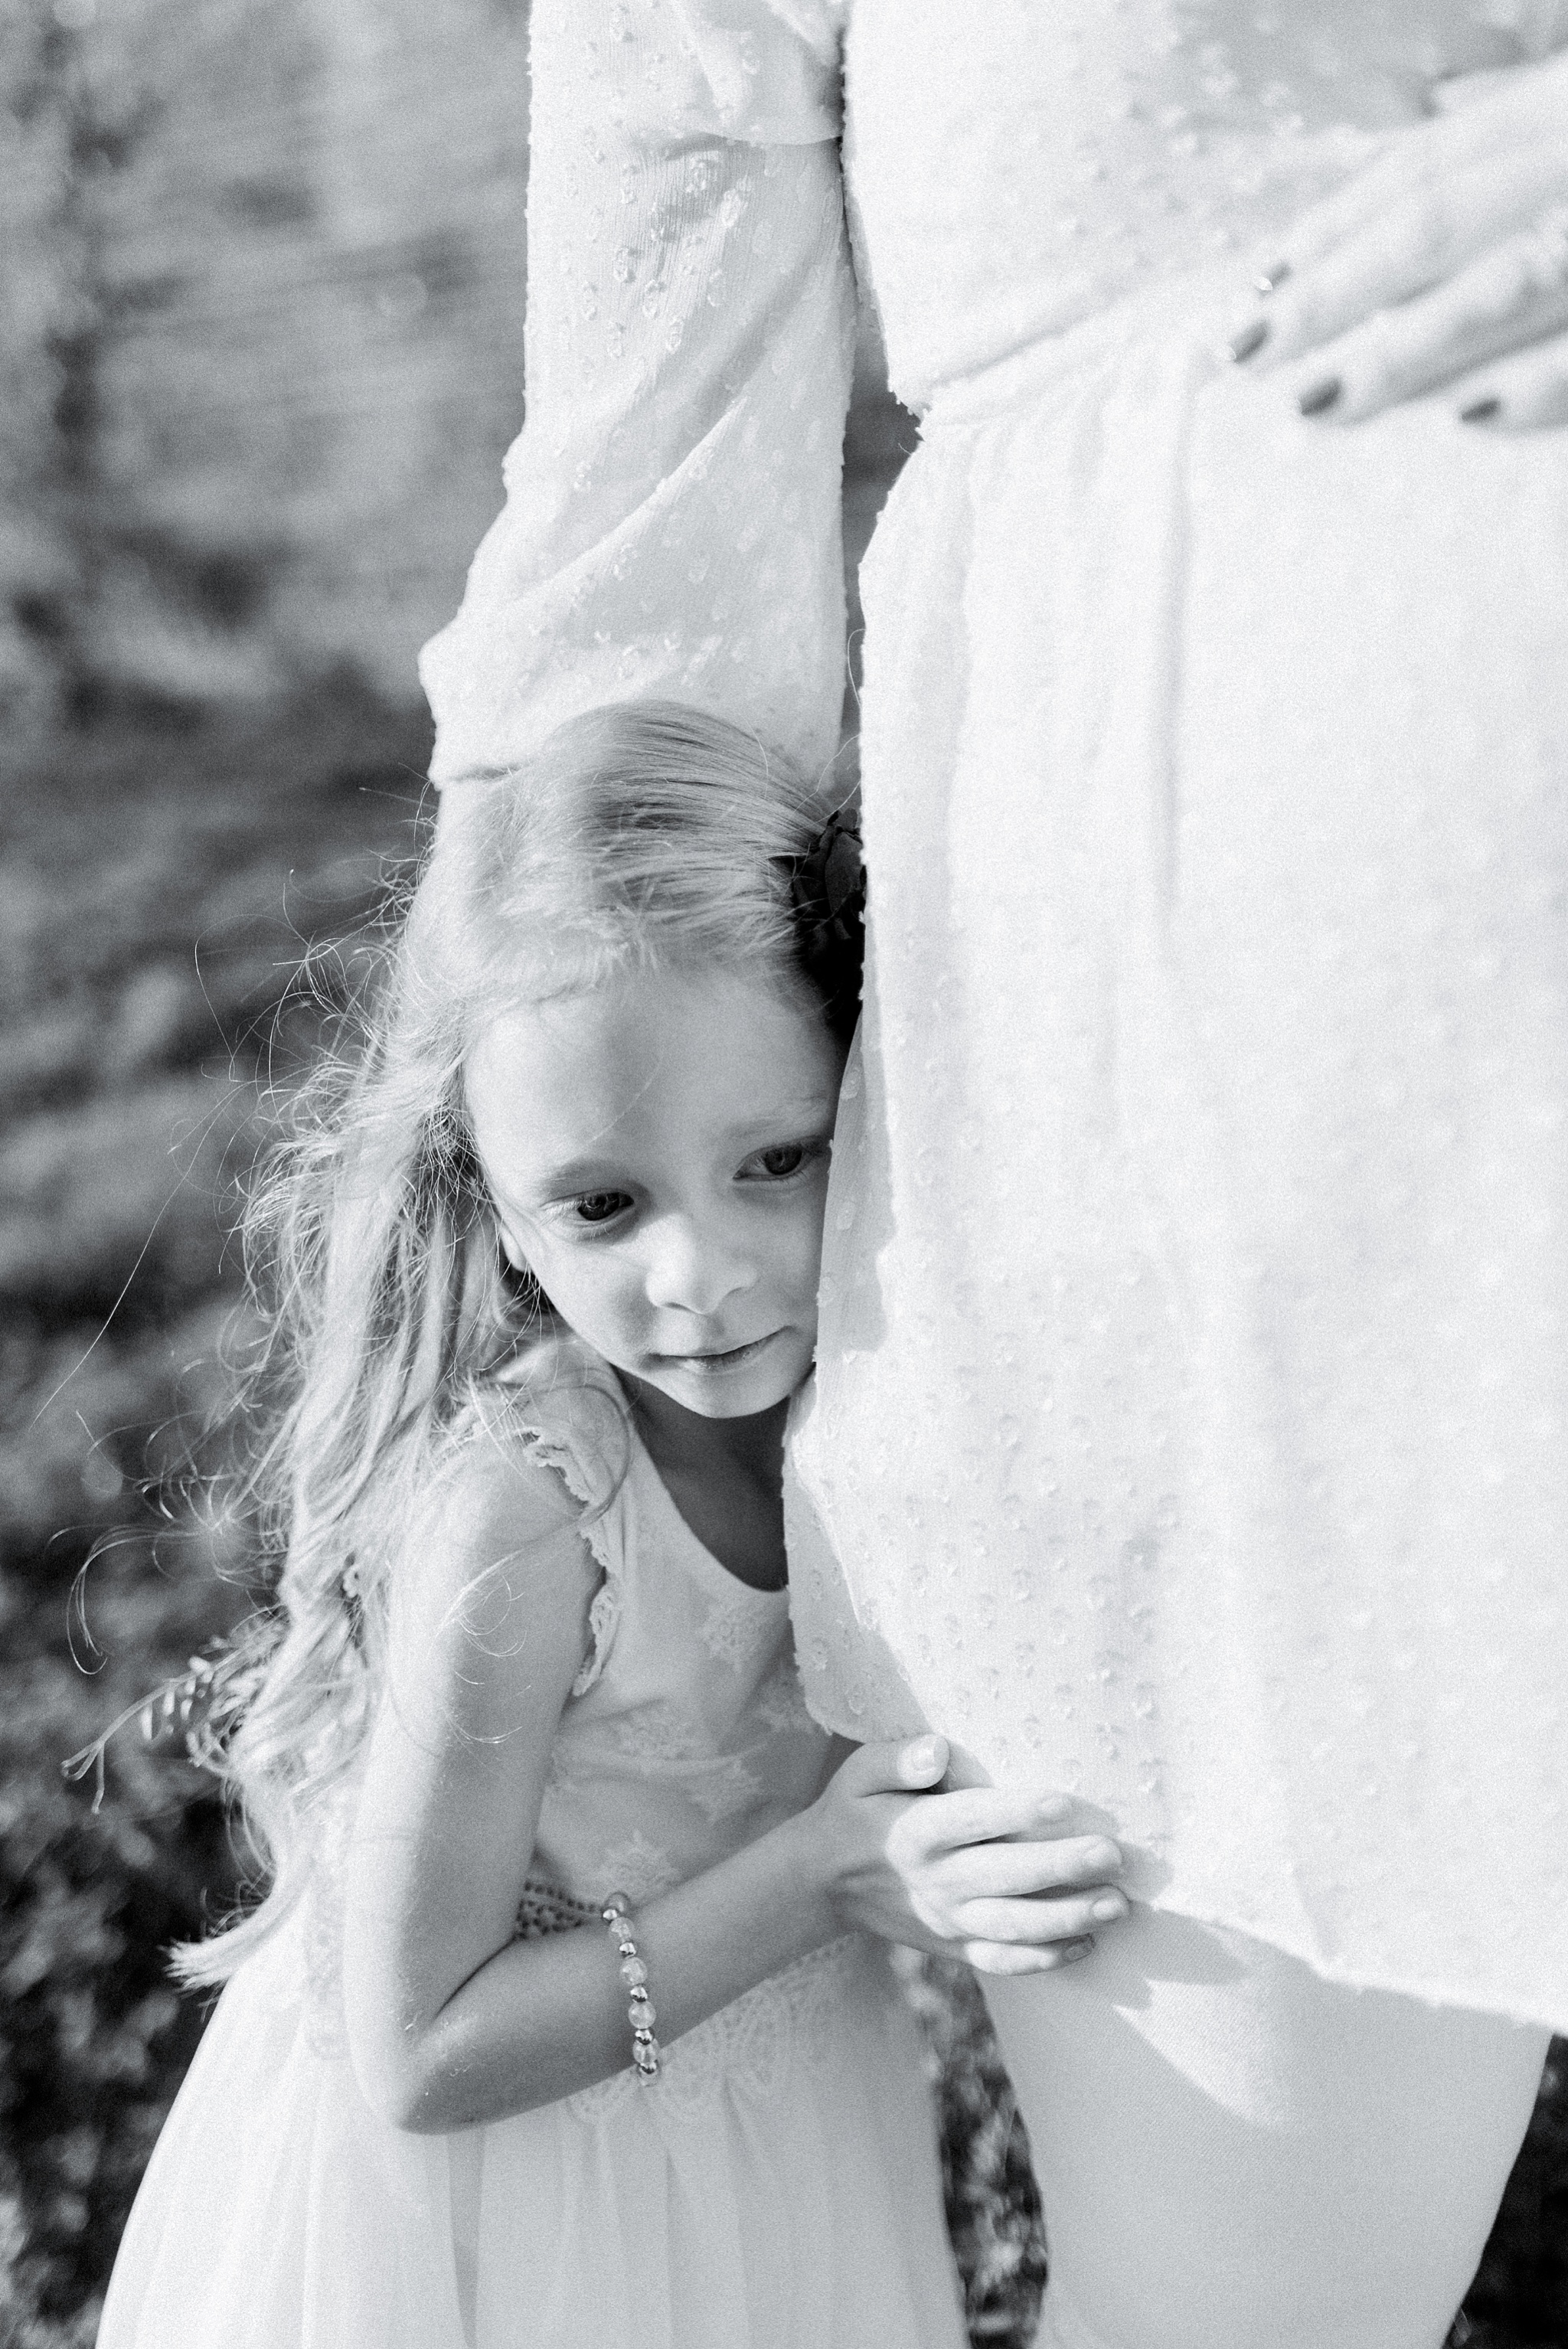 senoia-georgia-maternity-motherhood-photographer-moorebaby3-44.jpg